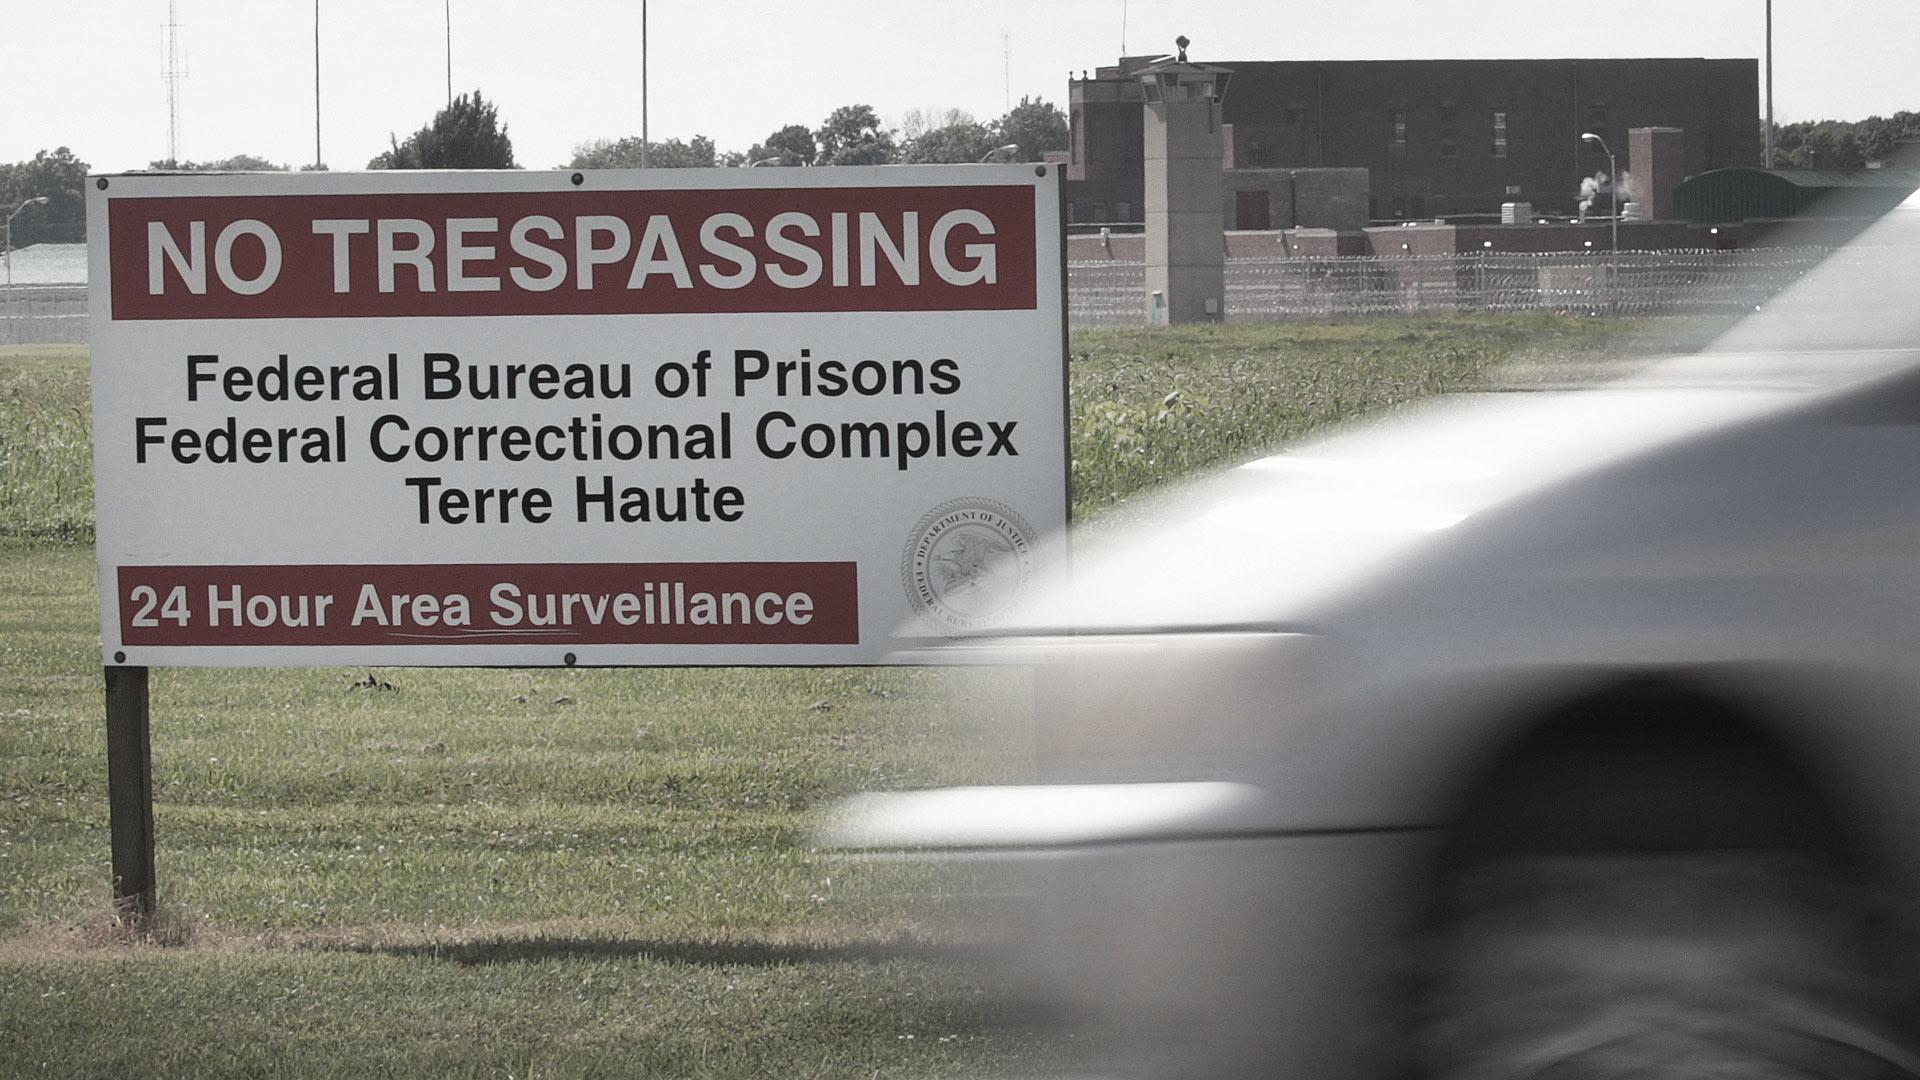 Terre Haute Prison, Indiana, US